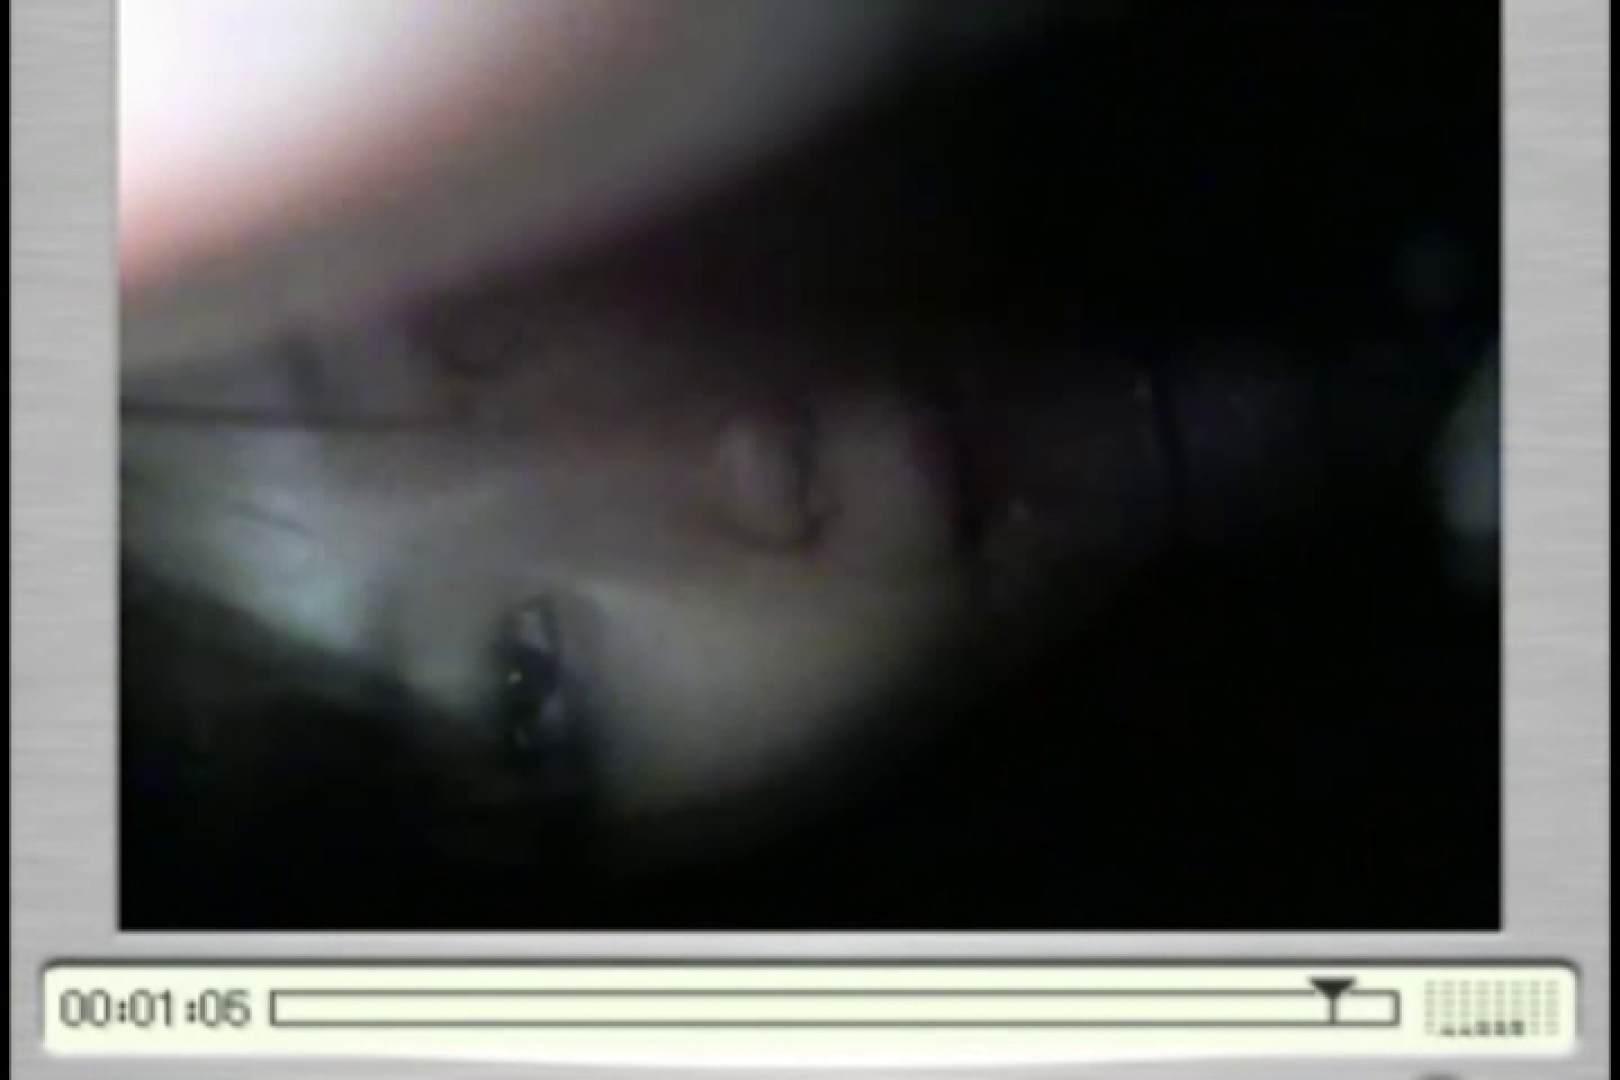 Shigeruのアルバム 流出作品  98pic 6